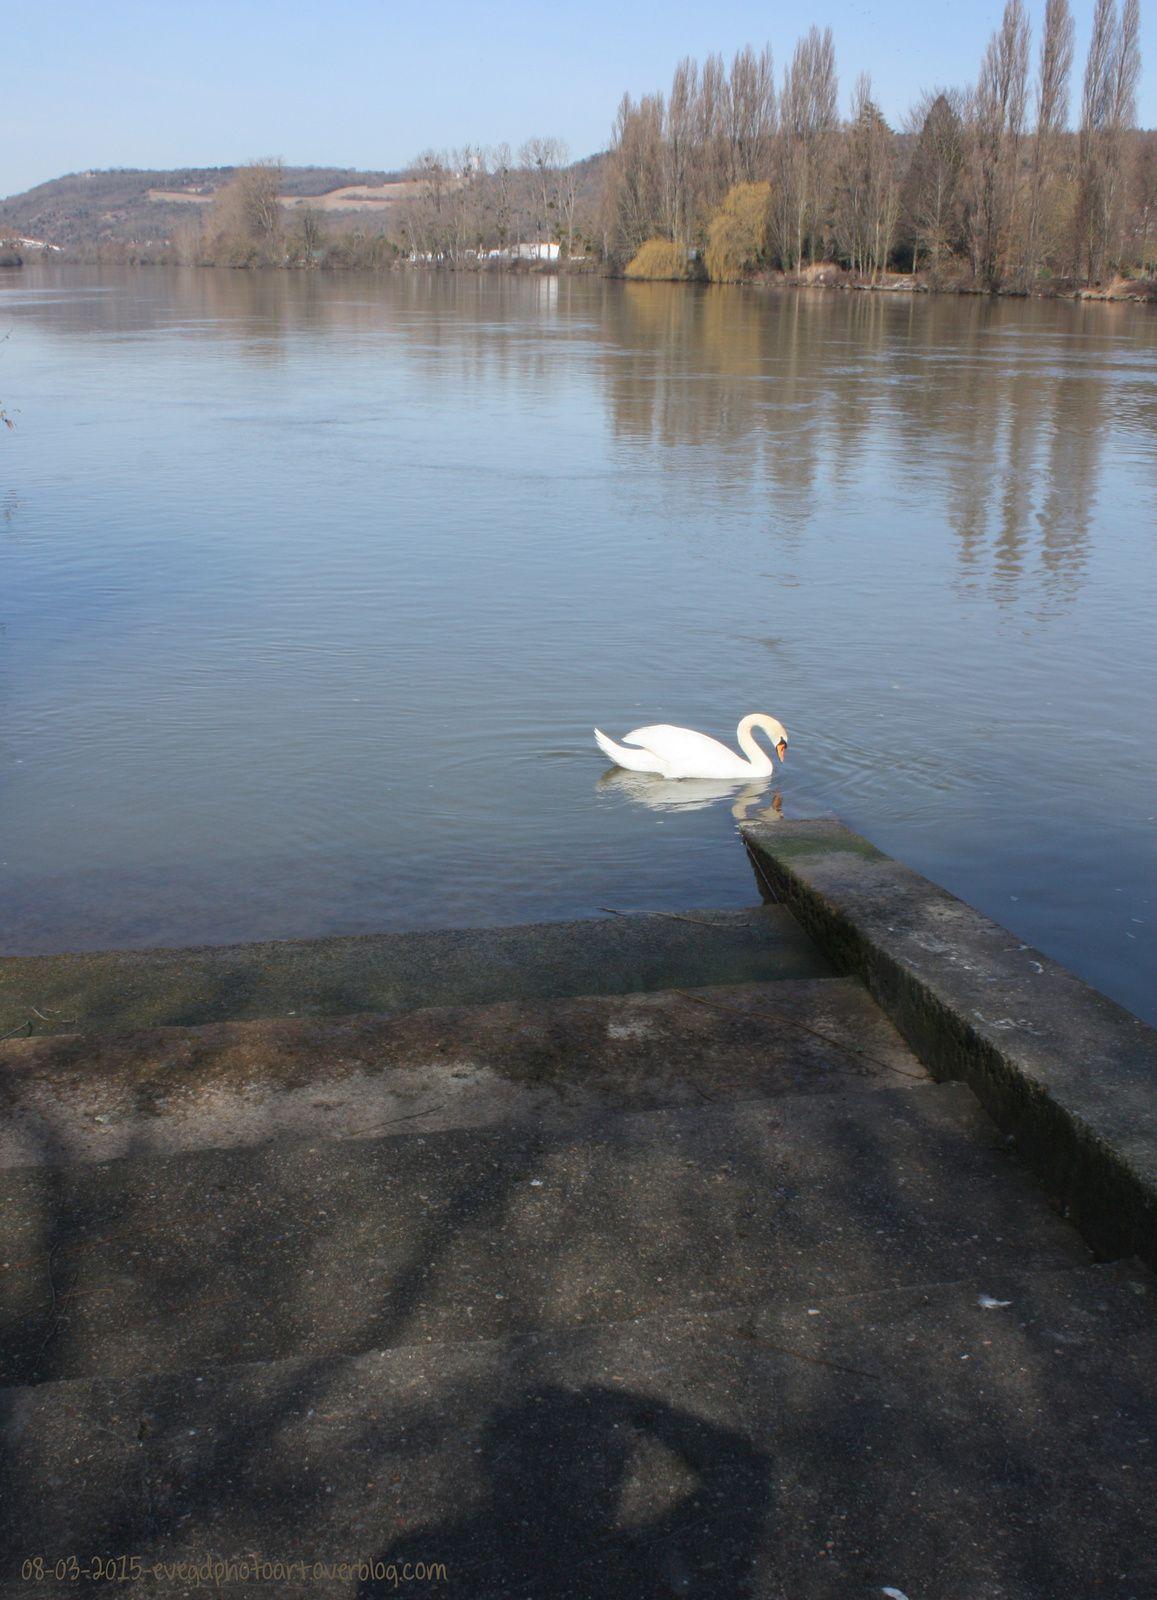 Les Bords de Seine.. Ca sent le printemps !!